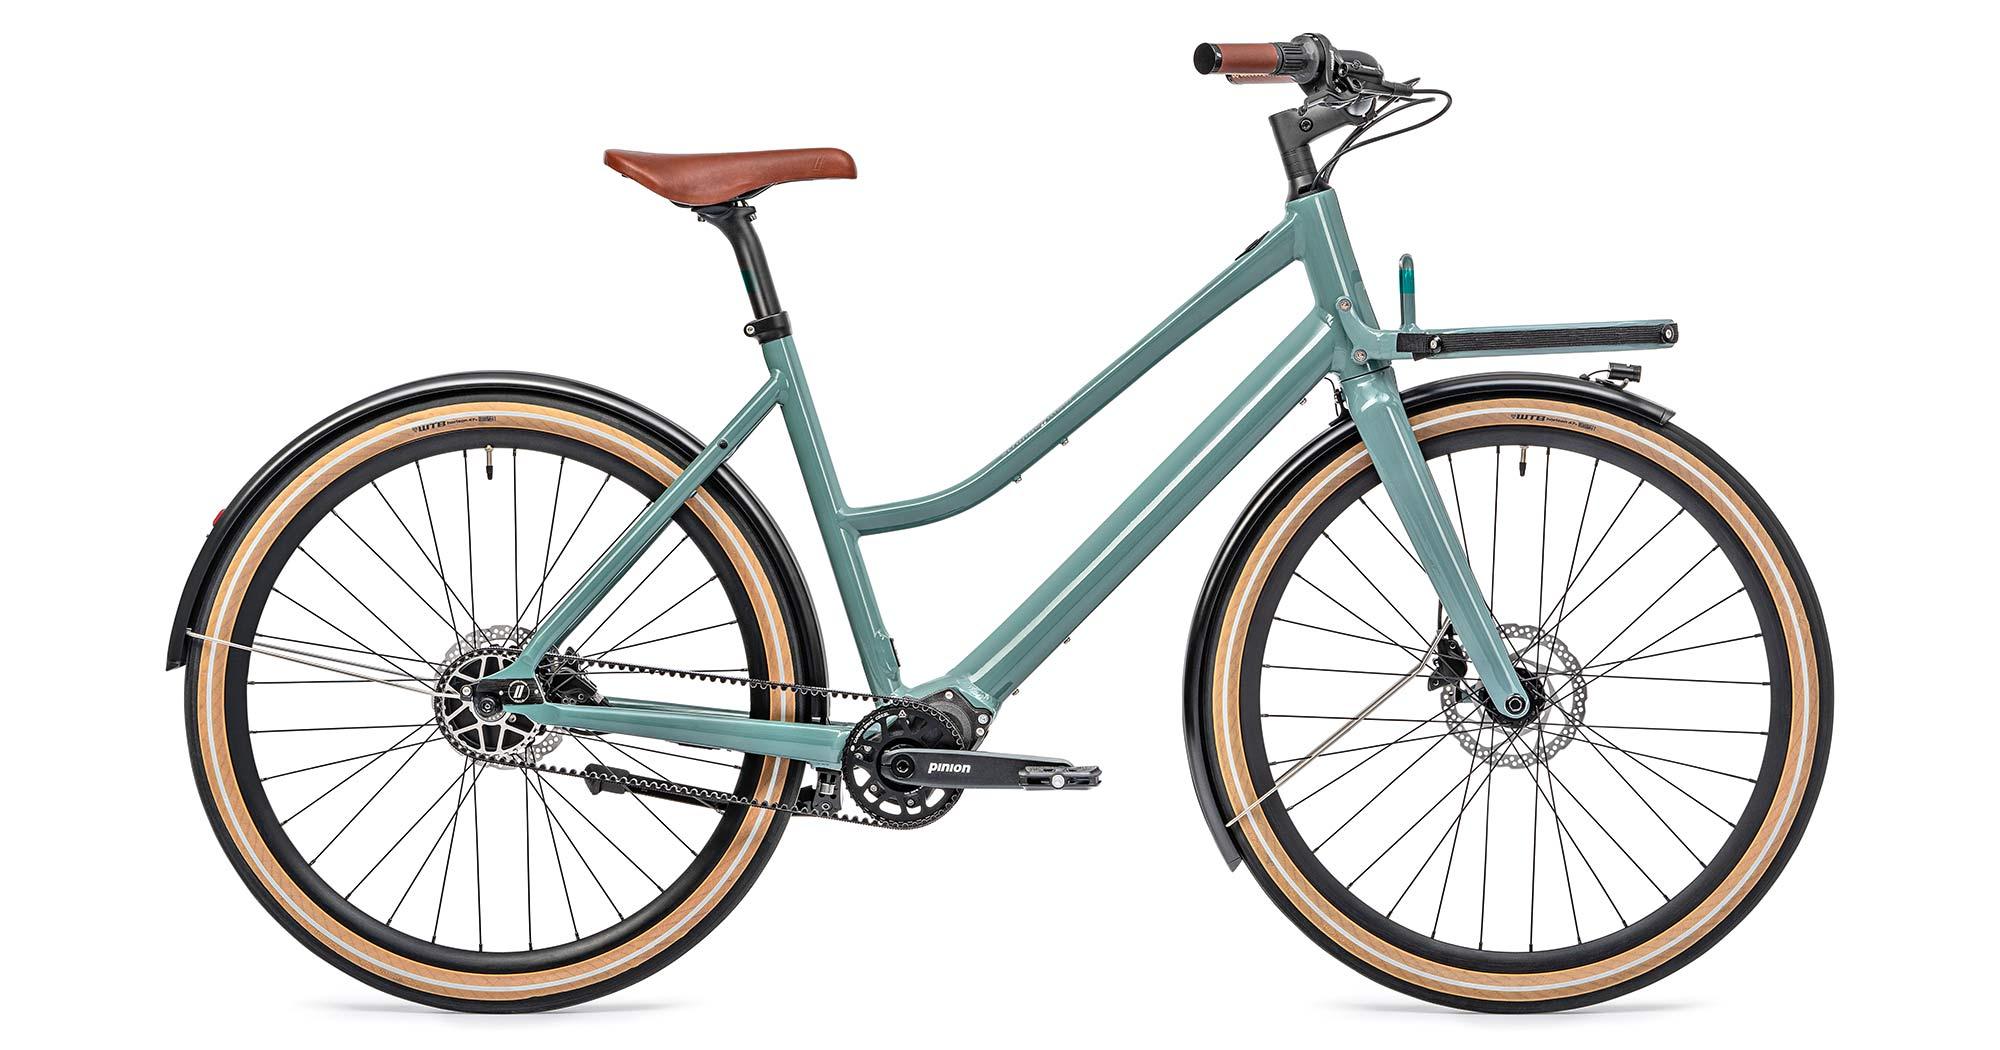 2021 Schindelhauer Emil Emilia porteur ebikemotion Pinion urban commuter city e-bikes